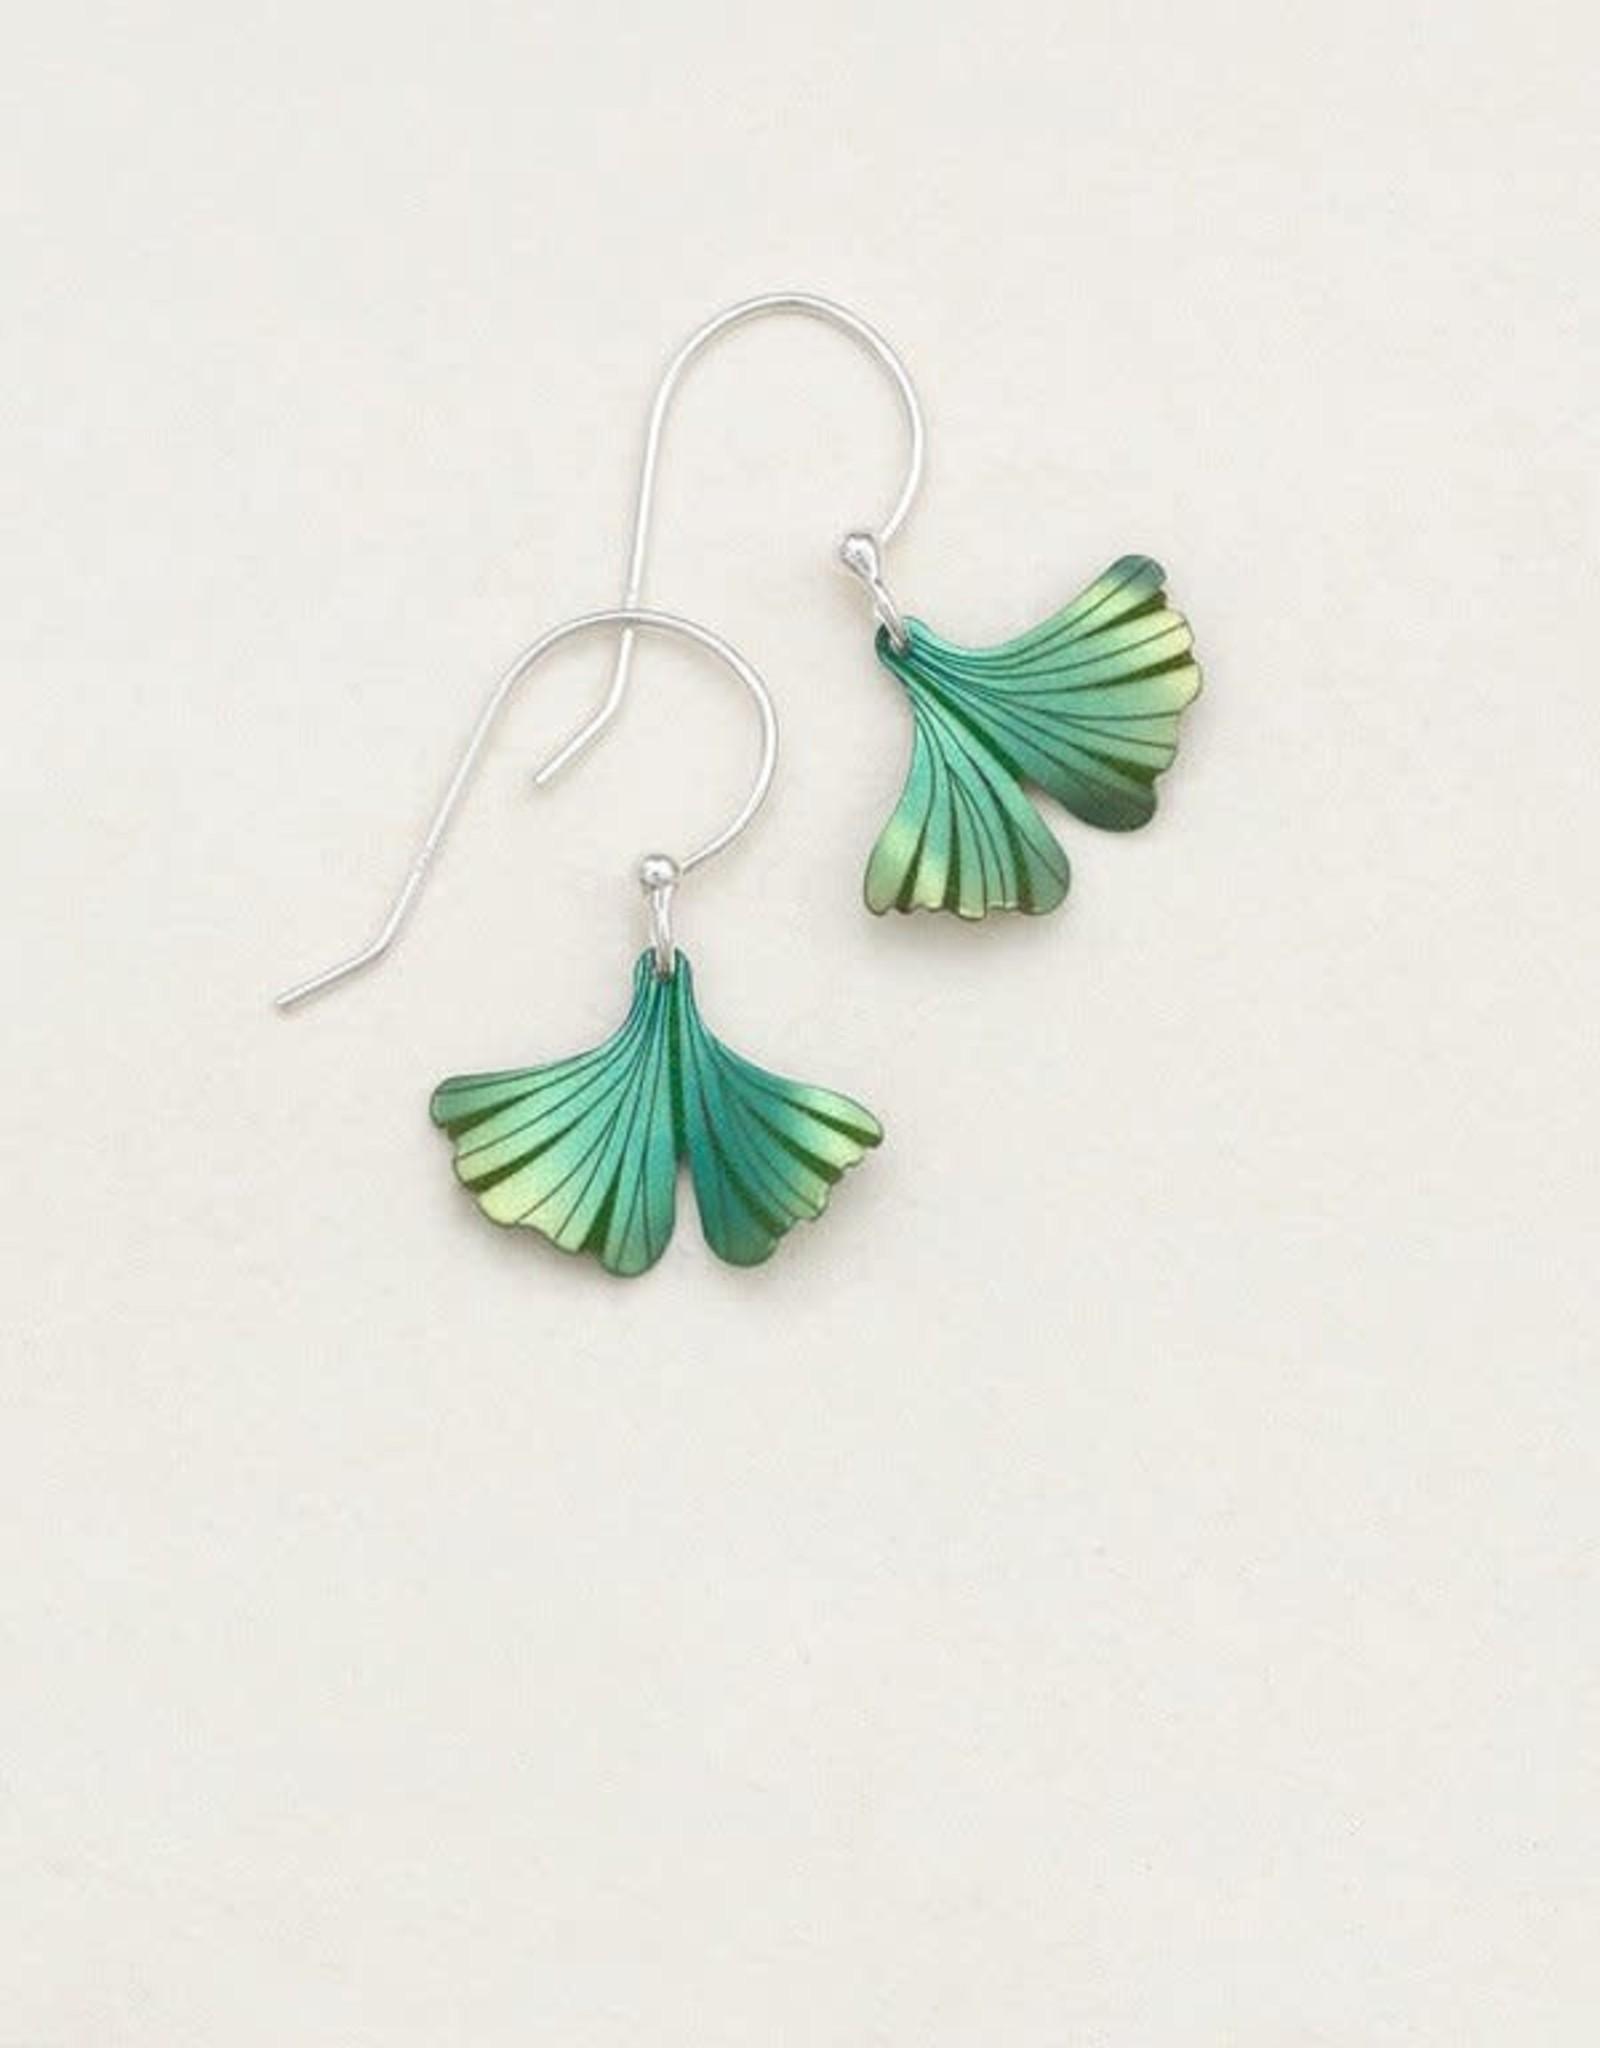 Holly Yashi Sage Petite Ginkgo Earrings